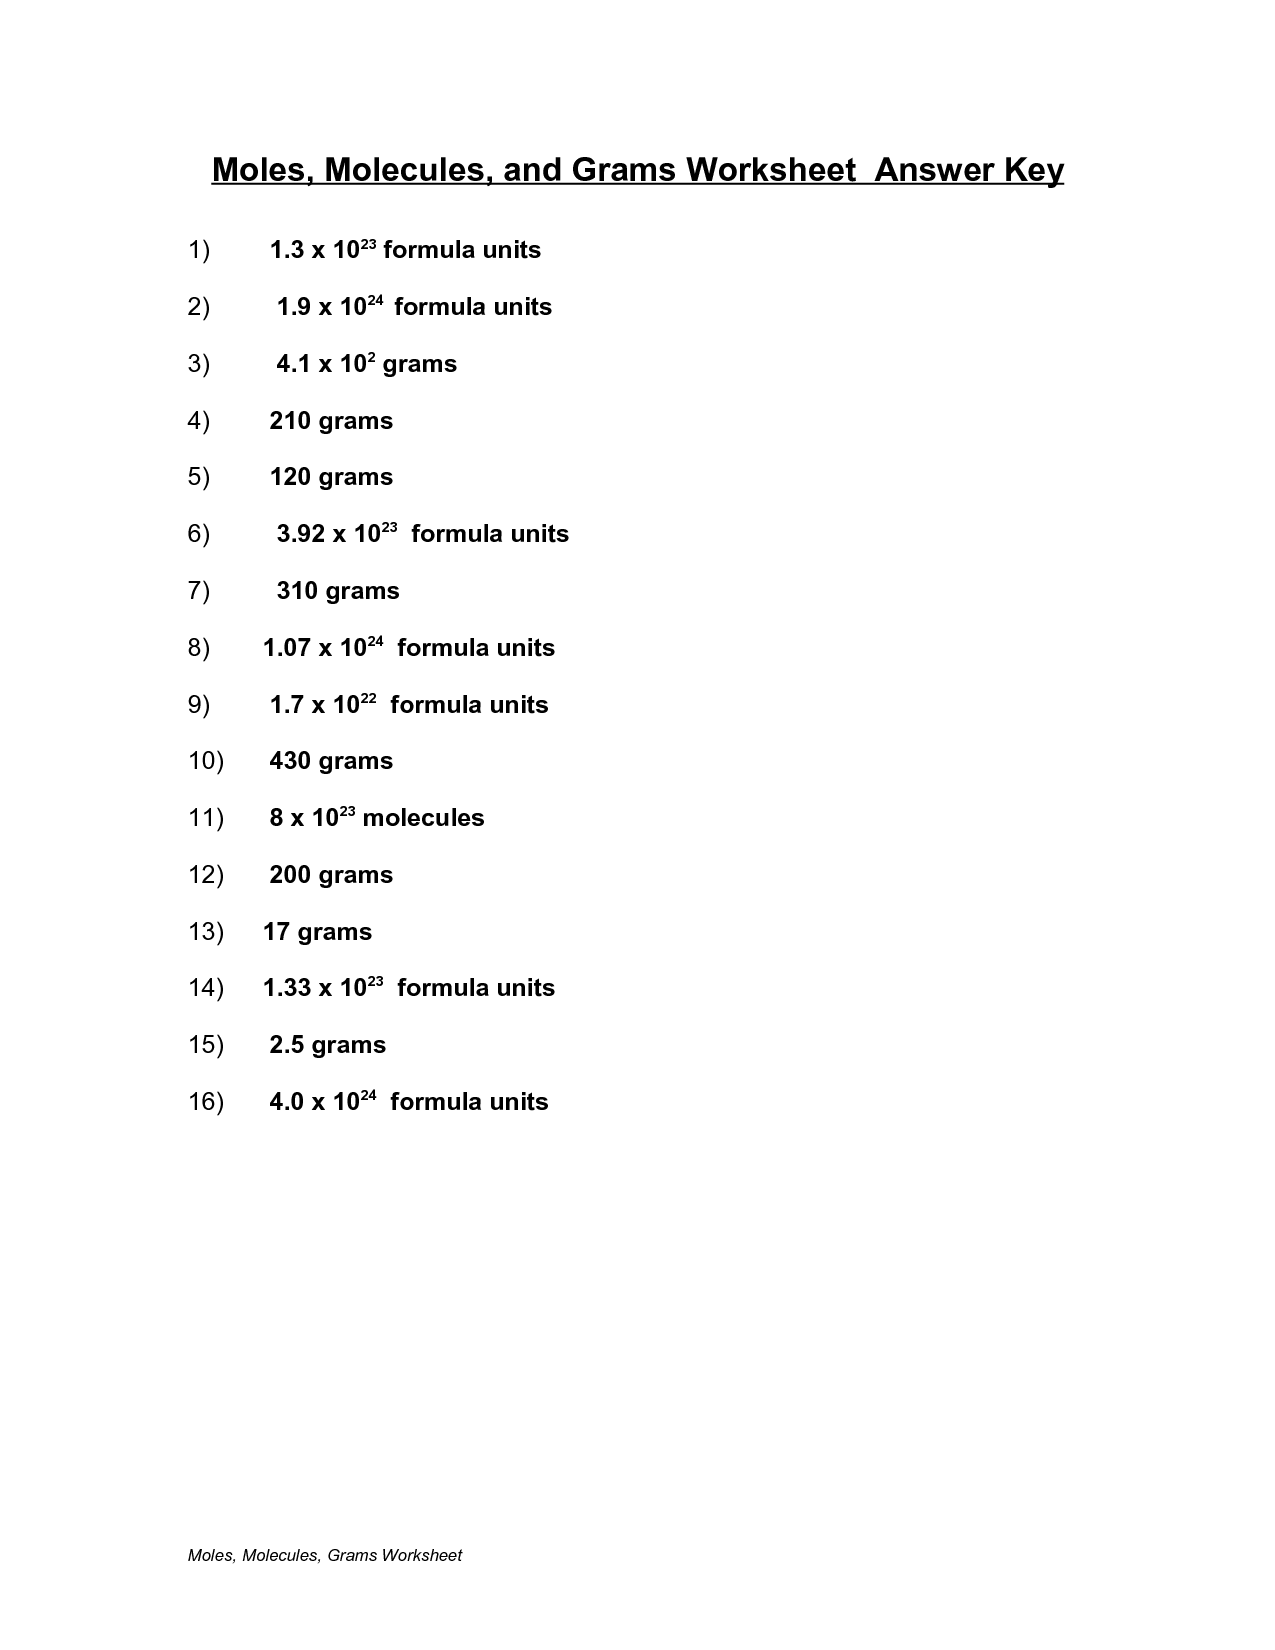 moles molecules and grams worksheet answer key